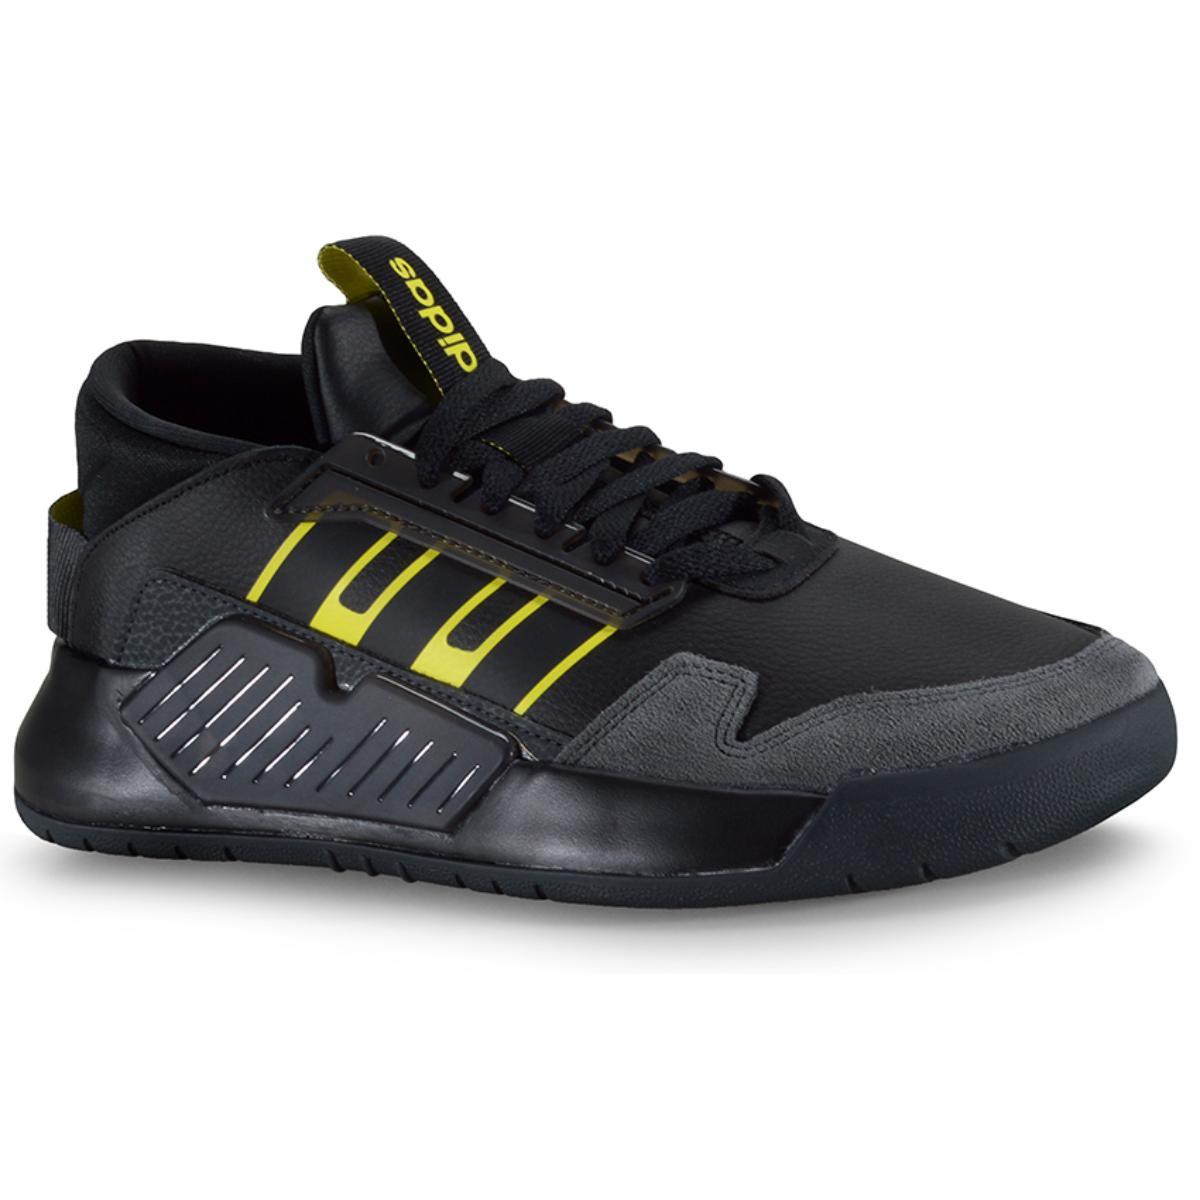 Tênis Masculino Adidas Eg9027 Bball90s m Preto/amarelo